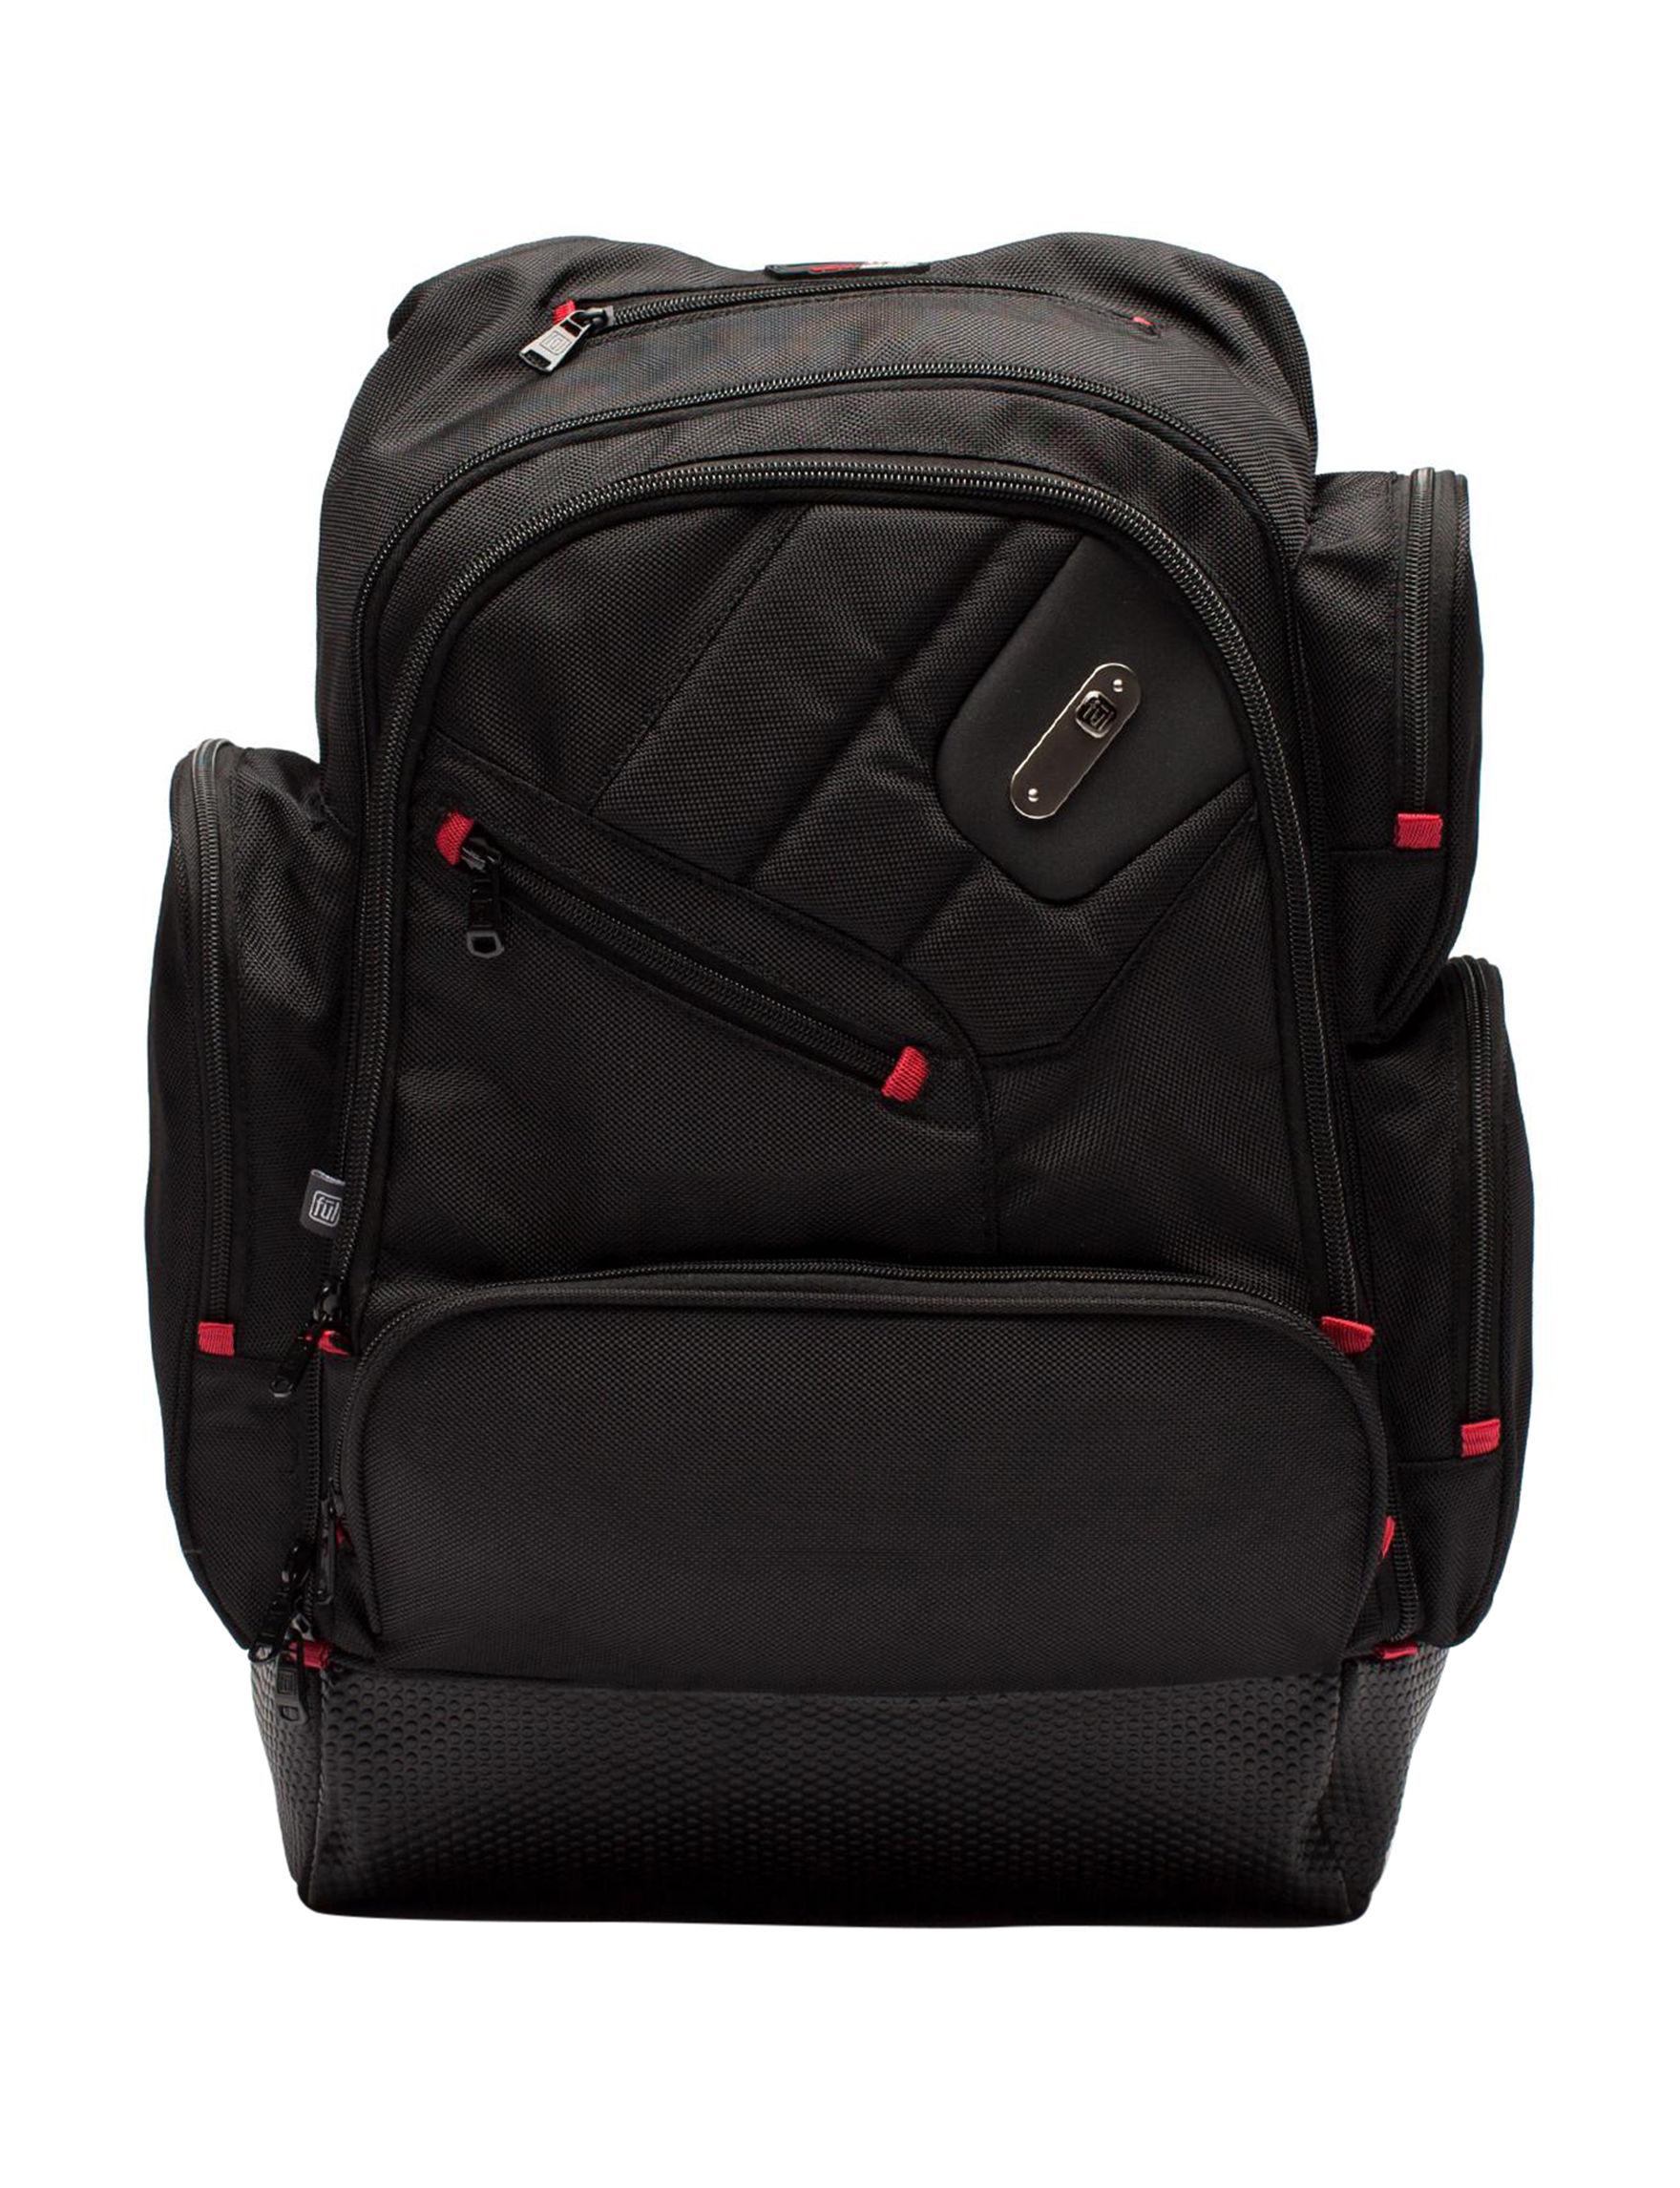 Ful Black Laptop & Messenger Bags